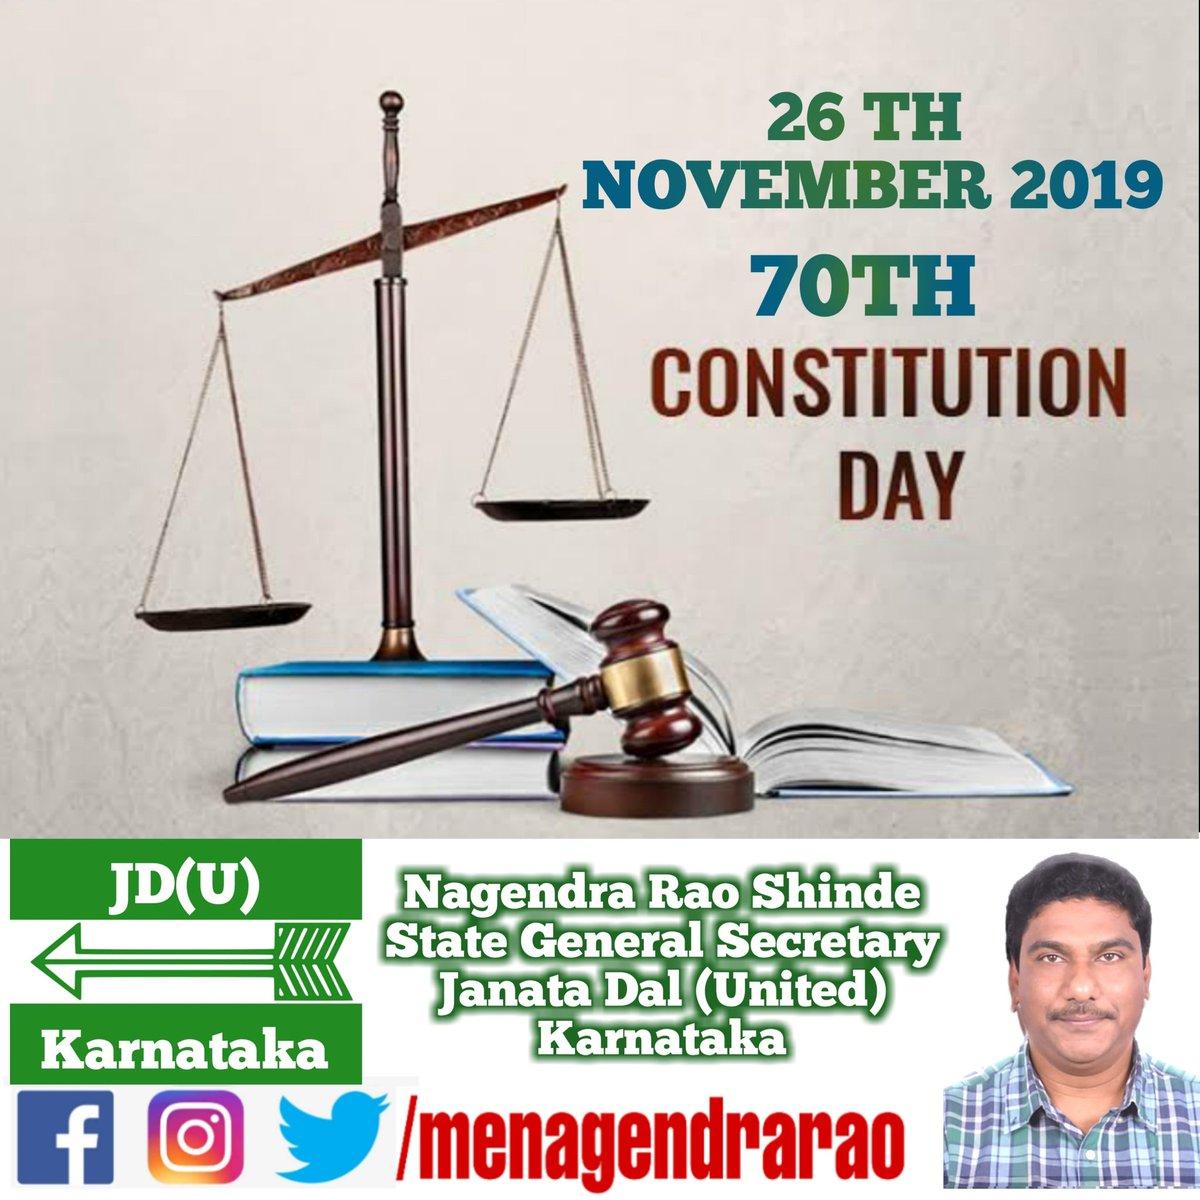 #ConstitutionDay #JDU #Karnataka @gsecretaryjdu @NitishKumar @PrashantKishor @afaquejdu @RCP_Singh @SanjayJhaBihar @JDU_India @Jduonline @KCTyagiJDU @sanjaykumarjdu https://t.co/fpW4wcOtjx